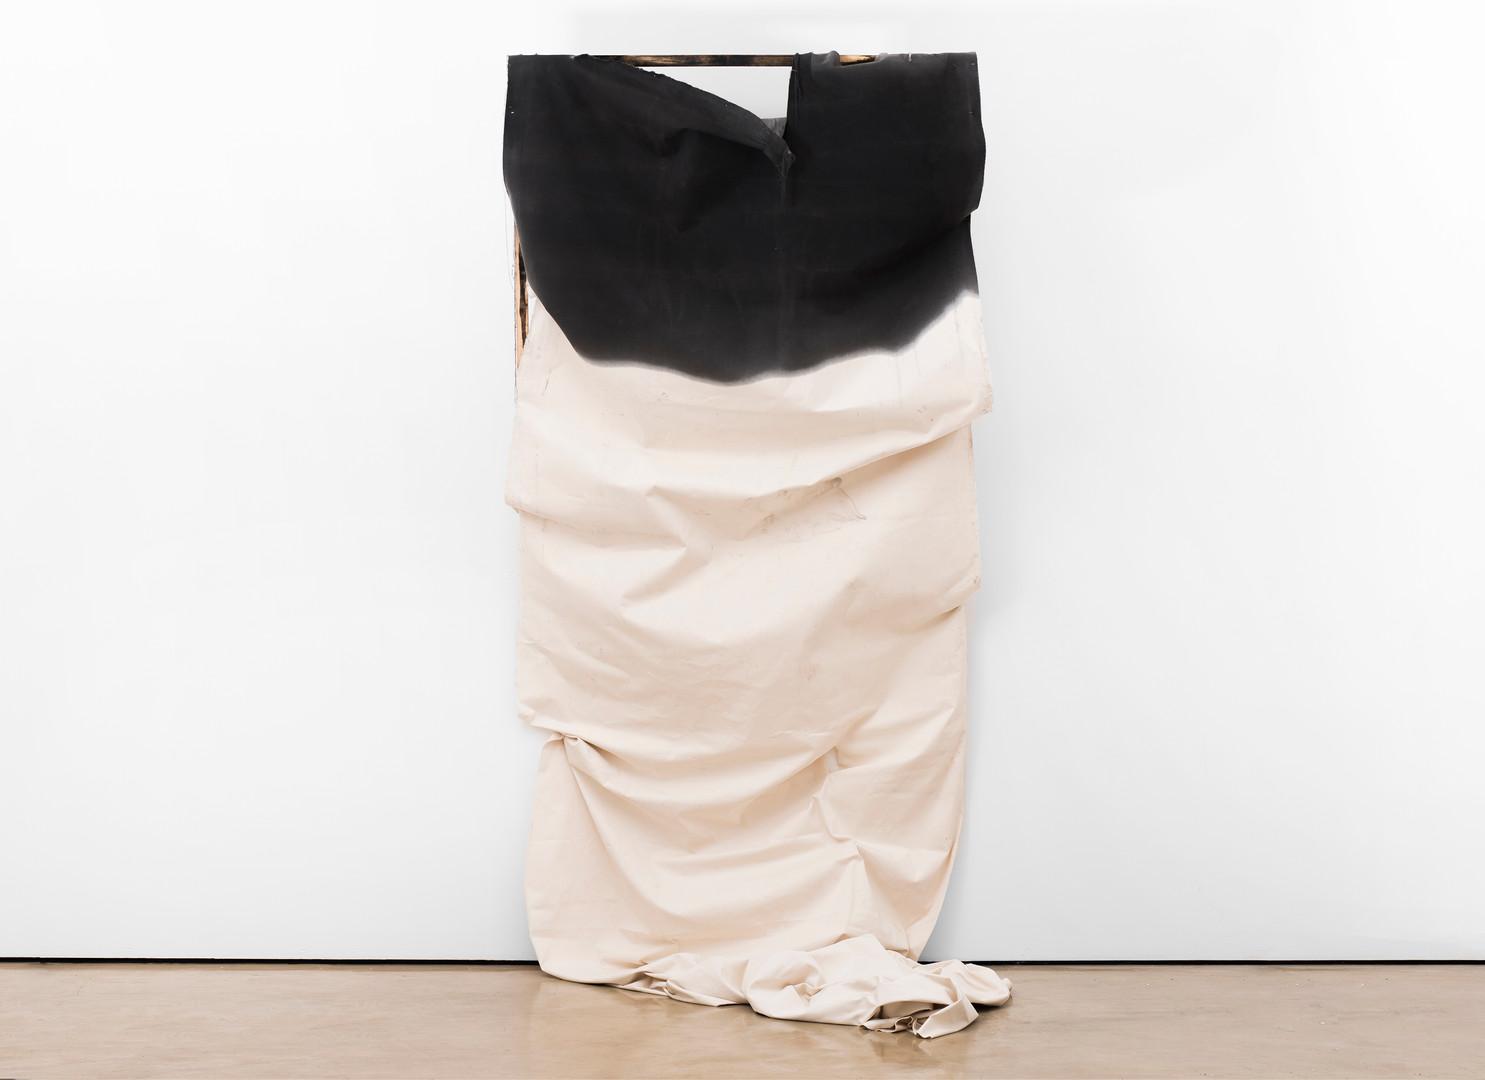 Alexandra Karakashian   Adrift (Collapse)   2017   Oil, Canvas and Wood   300 x 140 x 50 cm